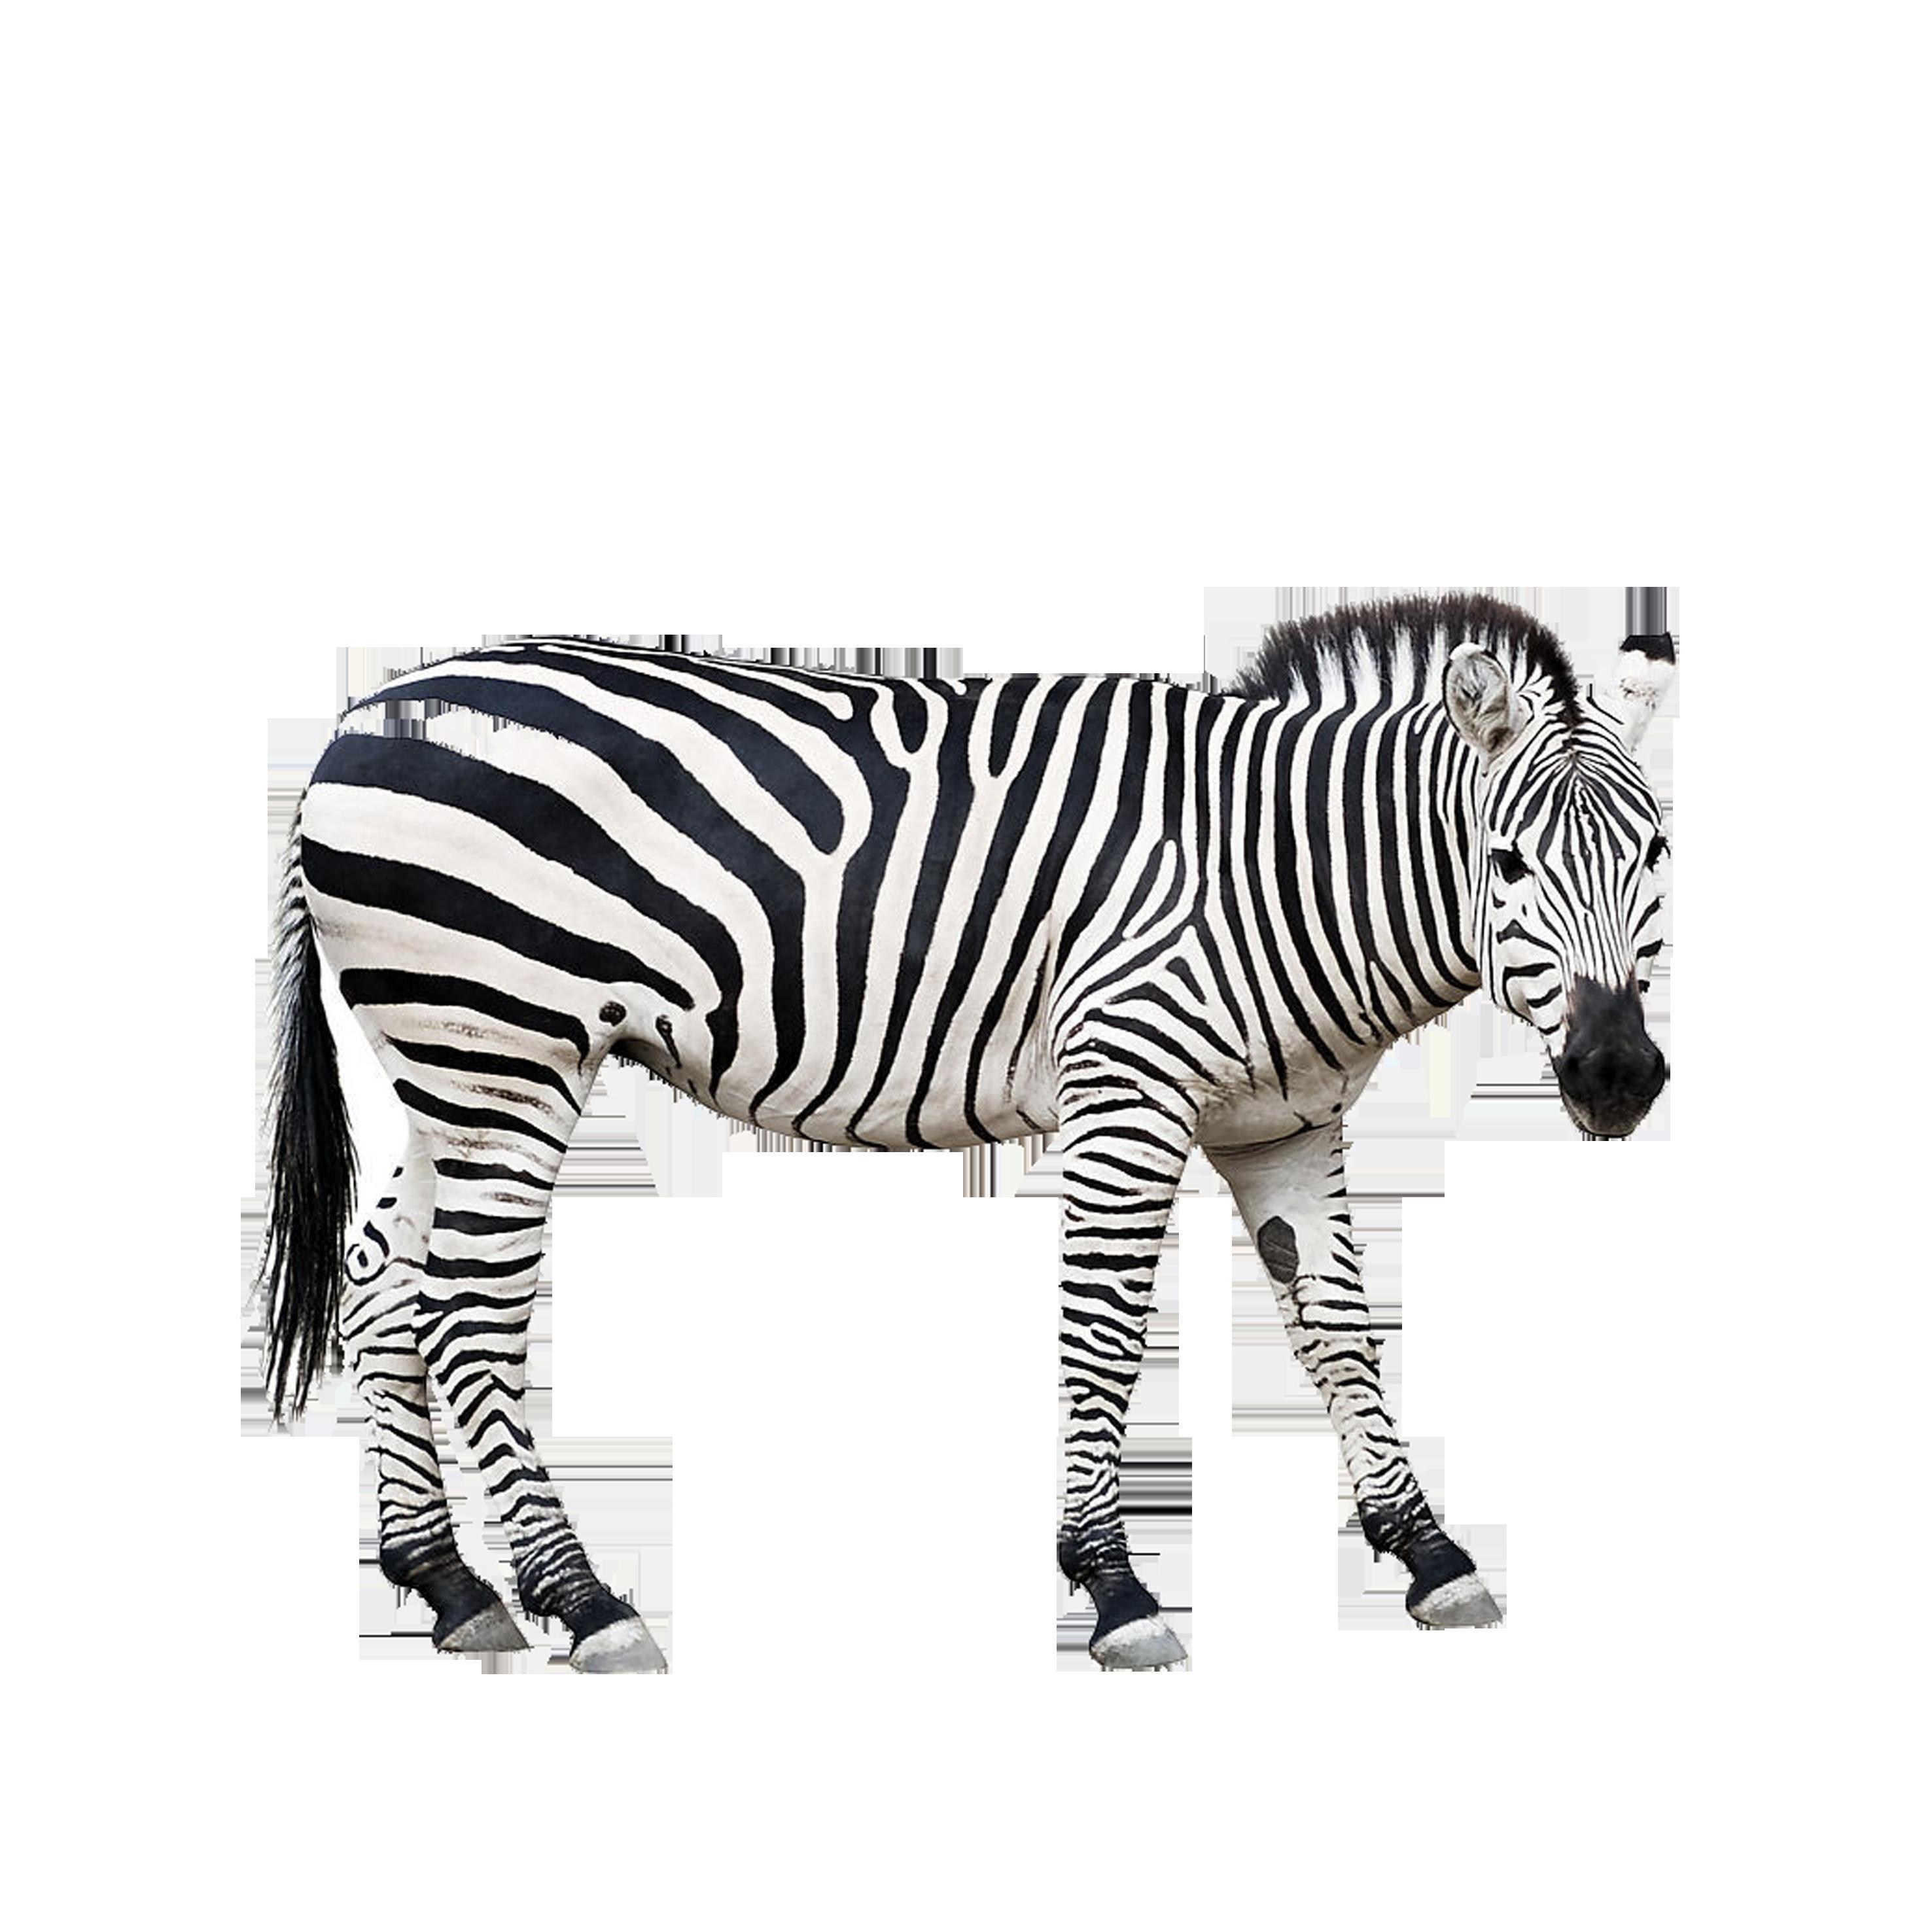 Zebra stock photography clip. Photographer clipart wildlife photographer